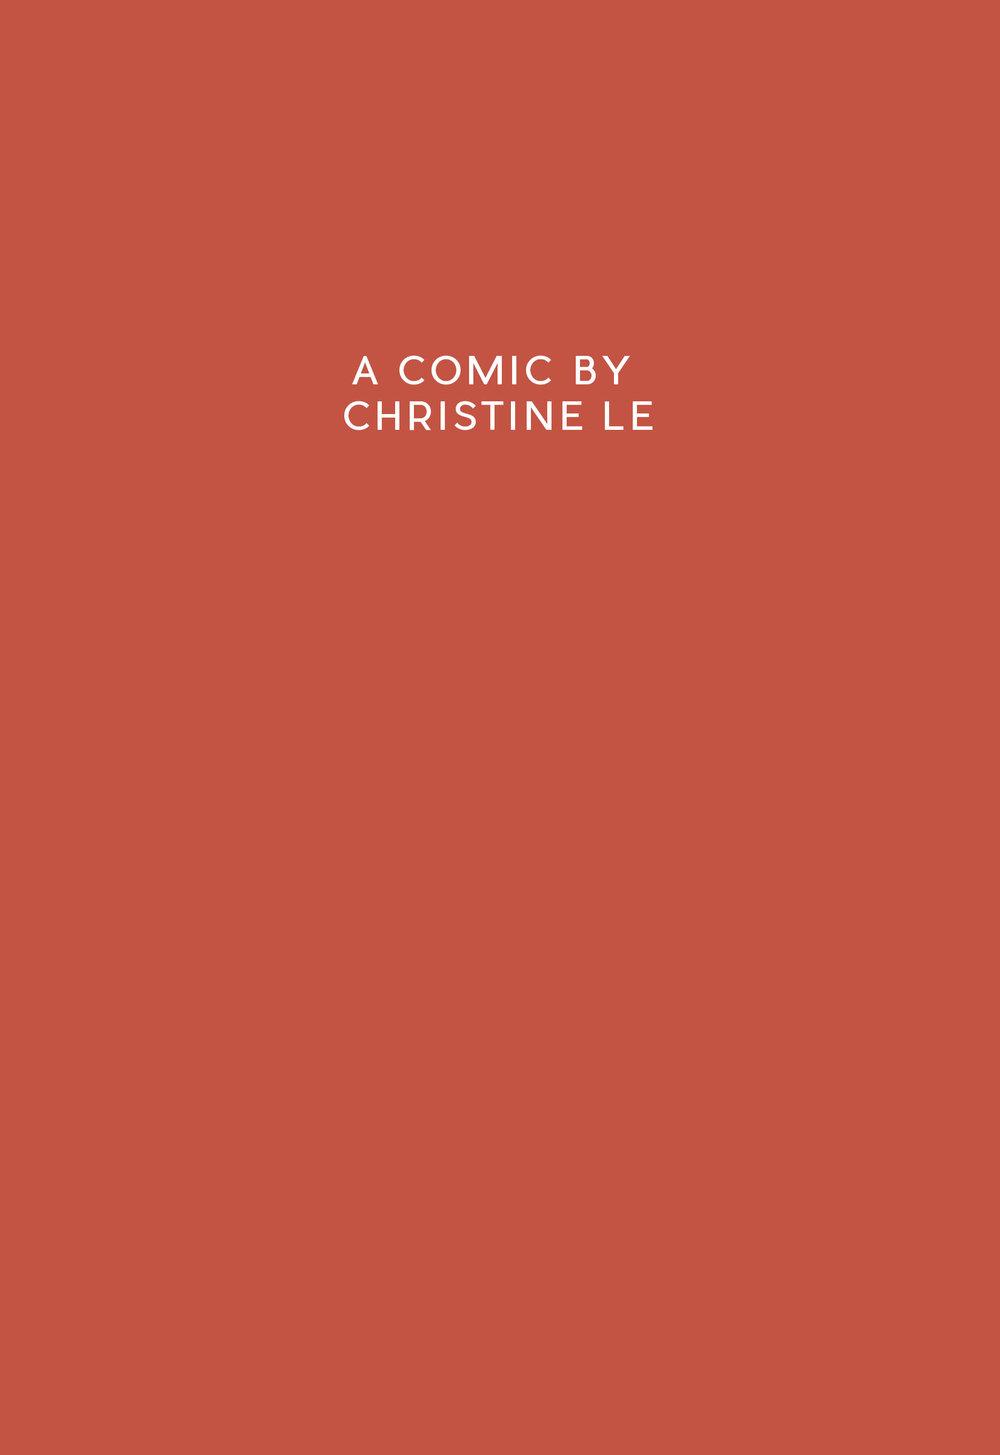 ChristineLe_VD_0001_titlepage.jpg